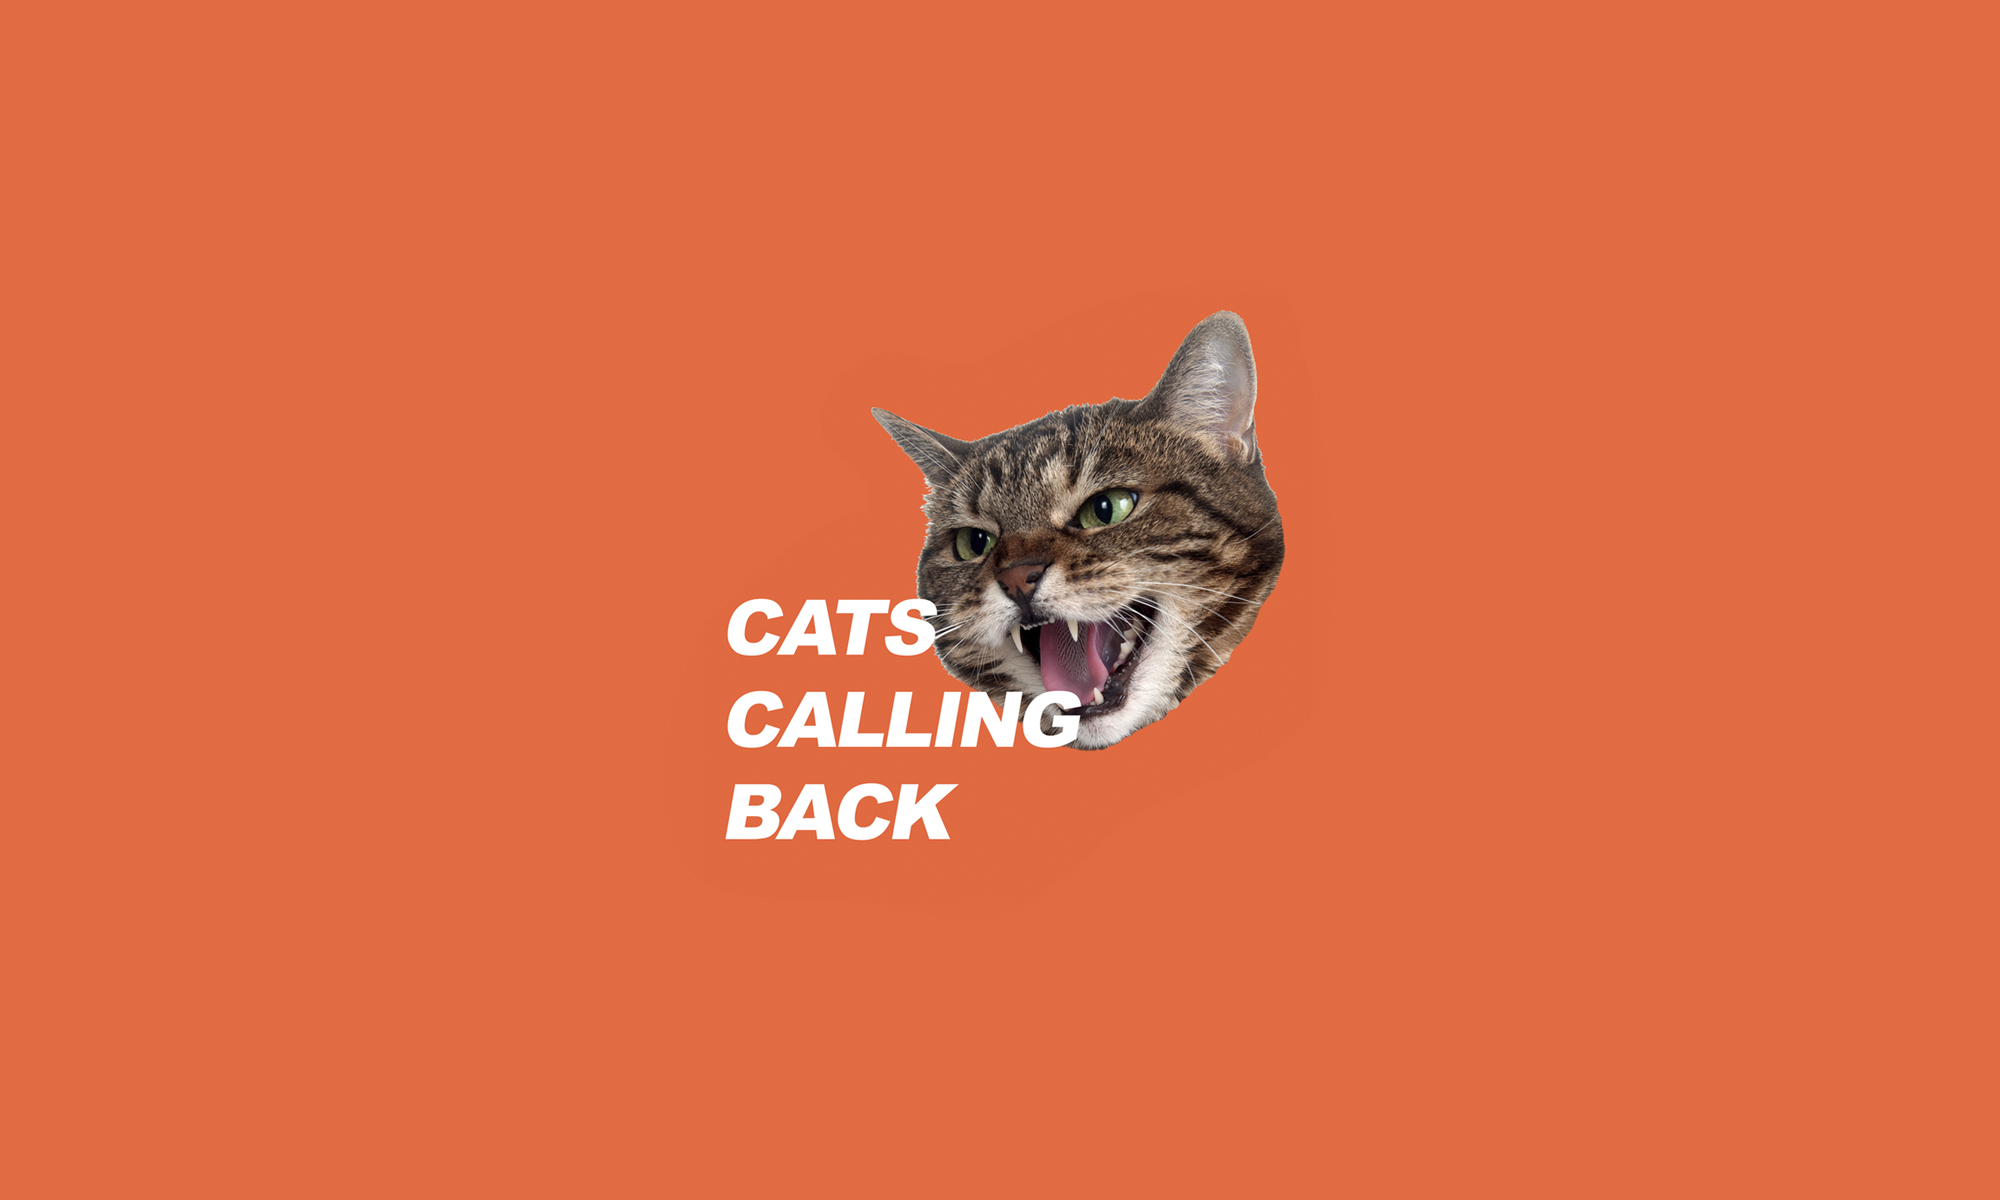 CATS CALLING BACK